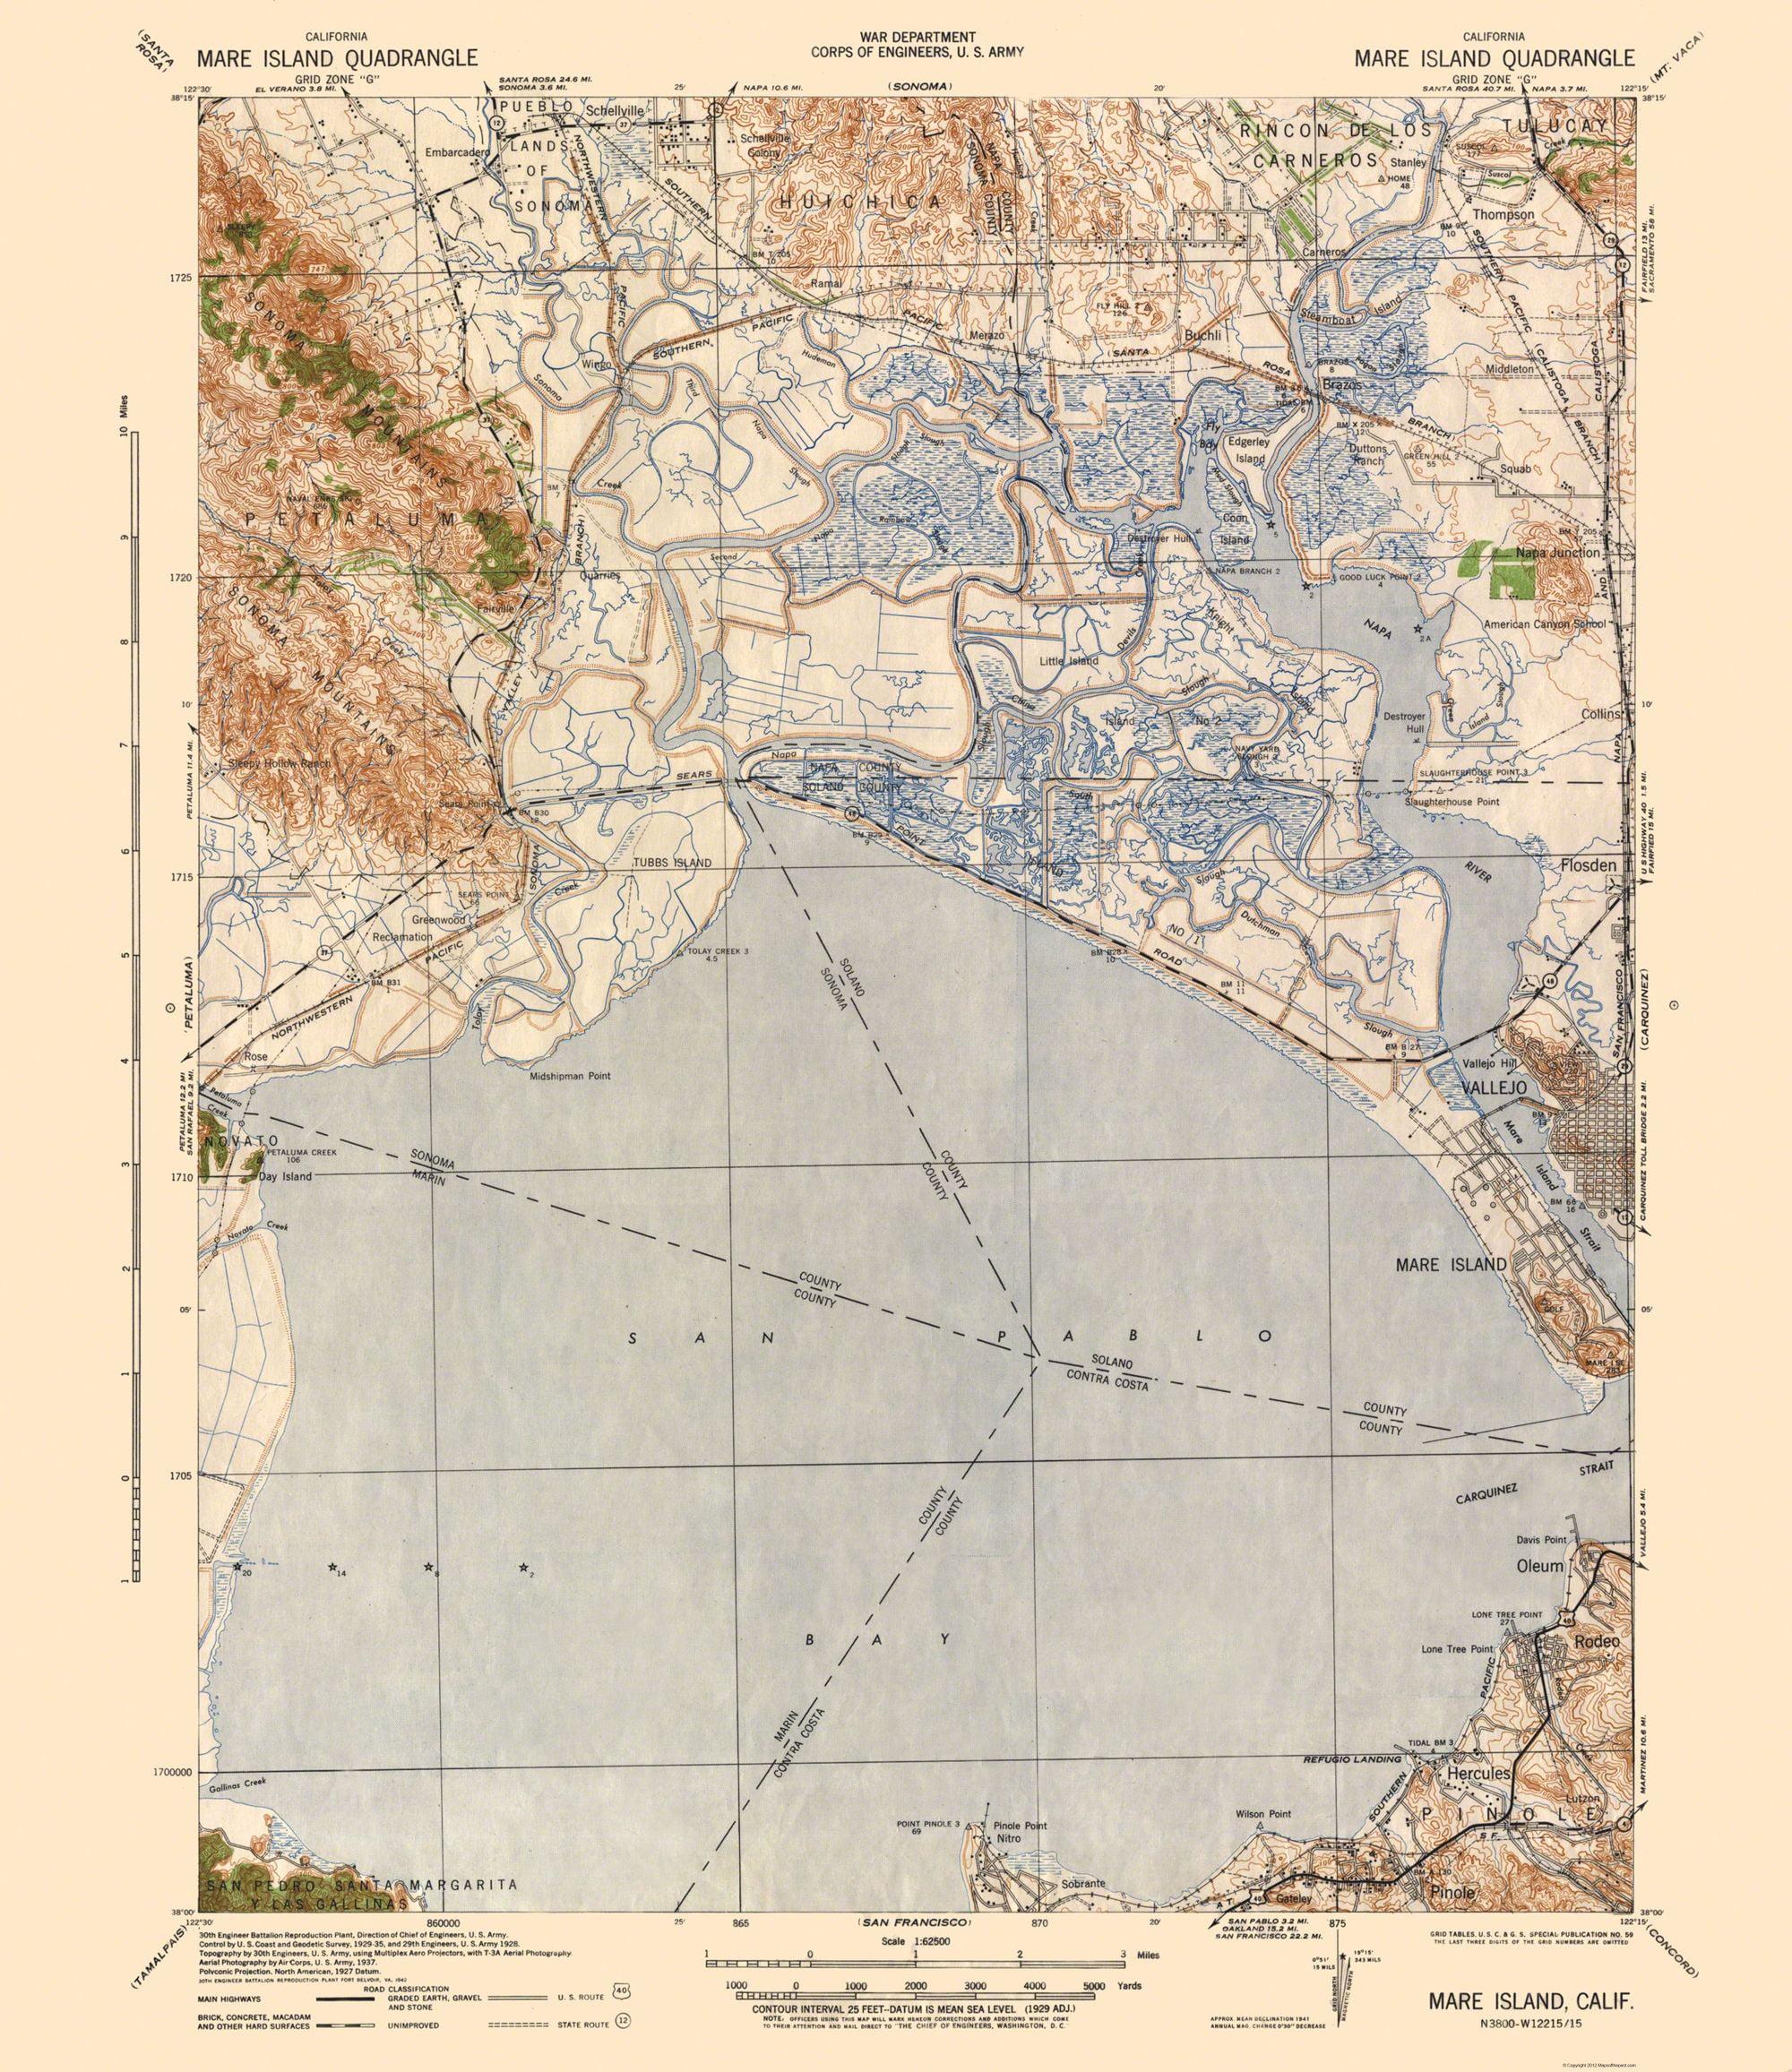 Topographic Map Washington Dc.Topographical Map Mare Island California Quad War Dept 1942 23